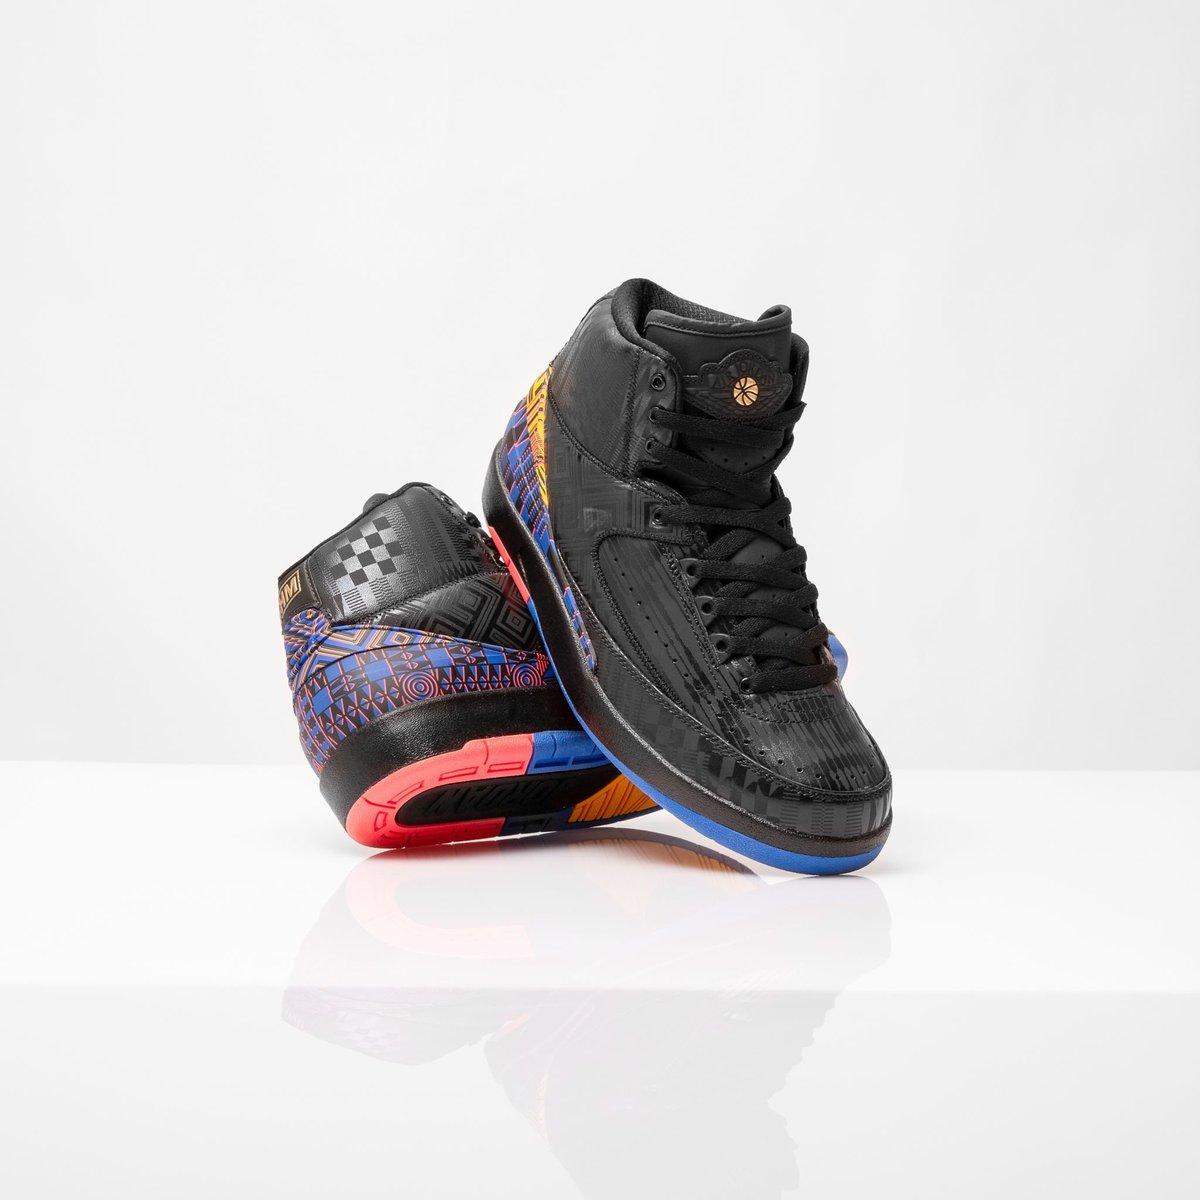 "Check this out!  S A L E 🌟  Air Jordan 2 Retro BHM - ""Black History Month"" SHOP NOW ✨ http://bit.ly/2IT3AeZ  #airjordan #airjordan2 #jordan #jordan2 #blackhistorymonth #bhm  #sale #sales #wintersale #salestyle #sneakers #sneaker"